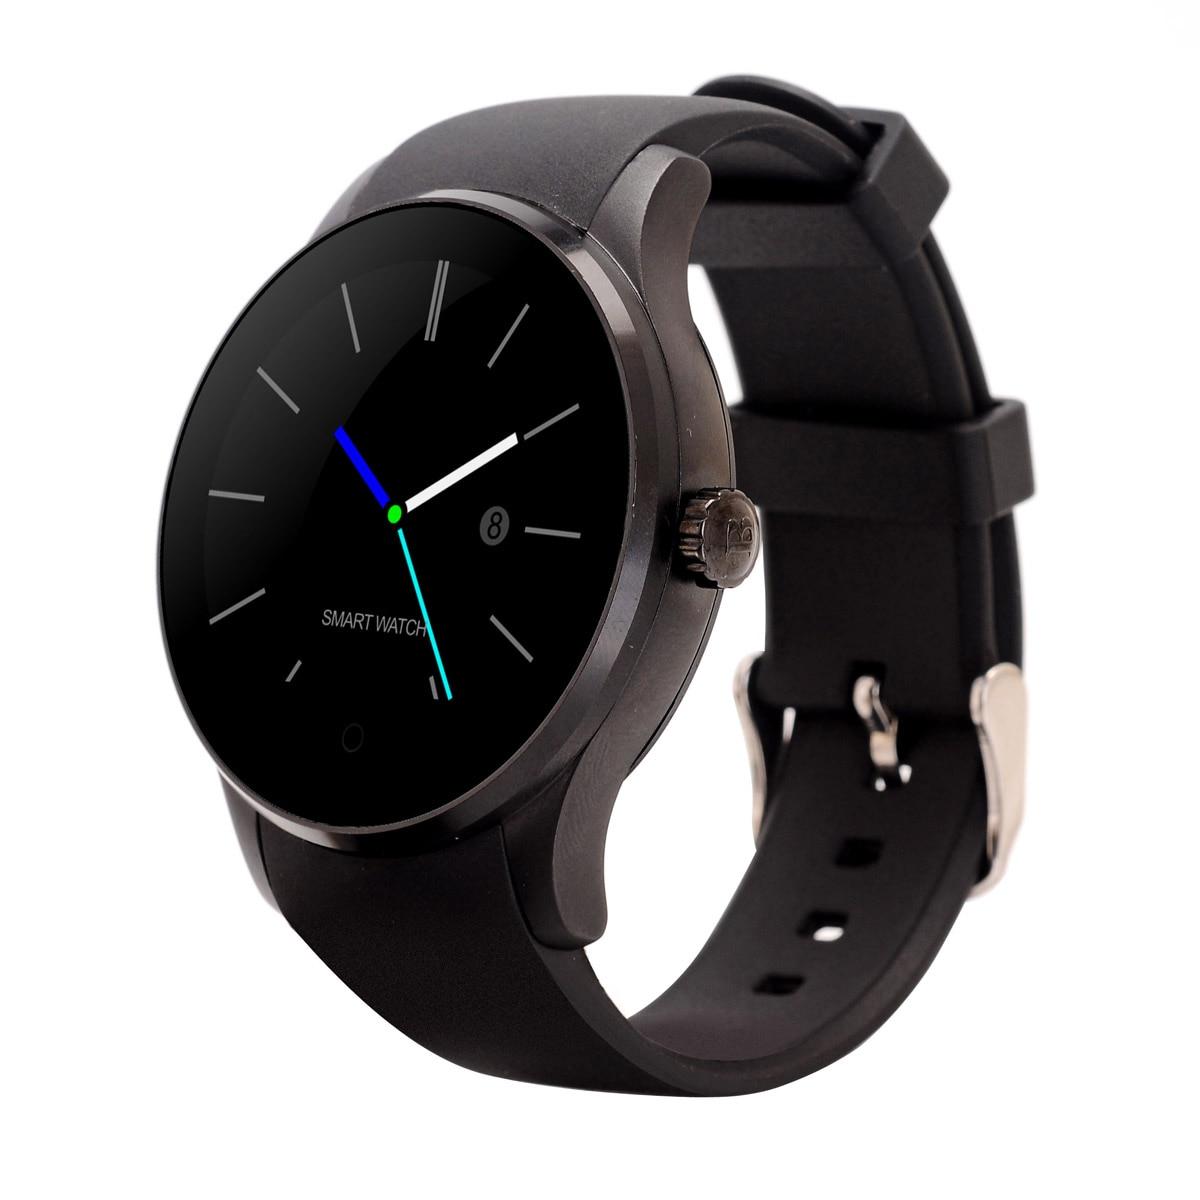 MTK2502 Round Bluetooth font b Smartwatch b font K88S Smart Watches Heart Rate Monitor Clock Phone